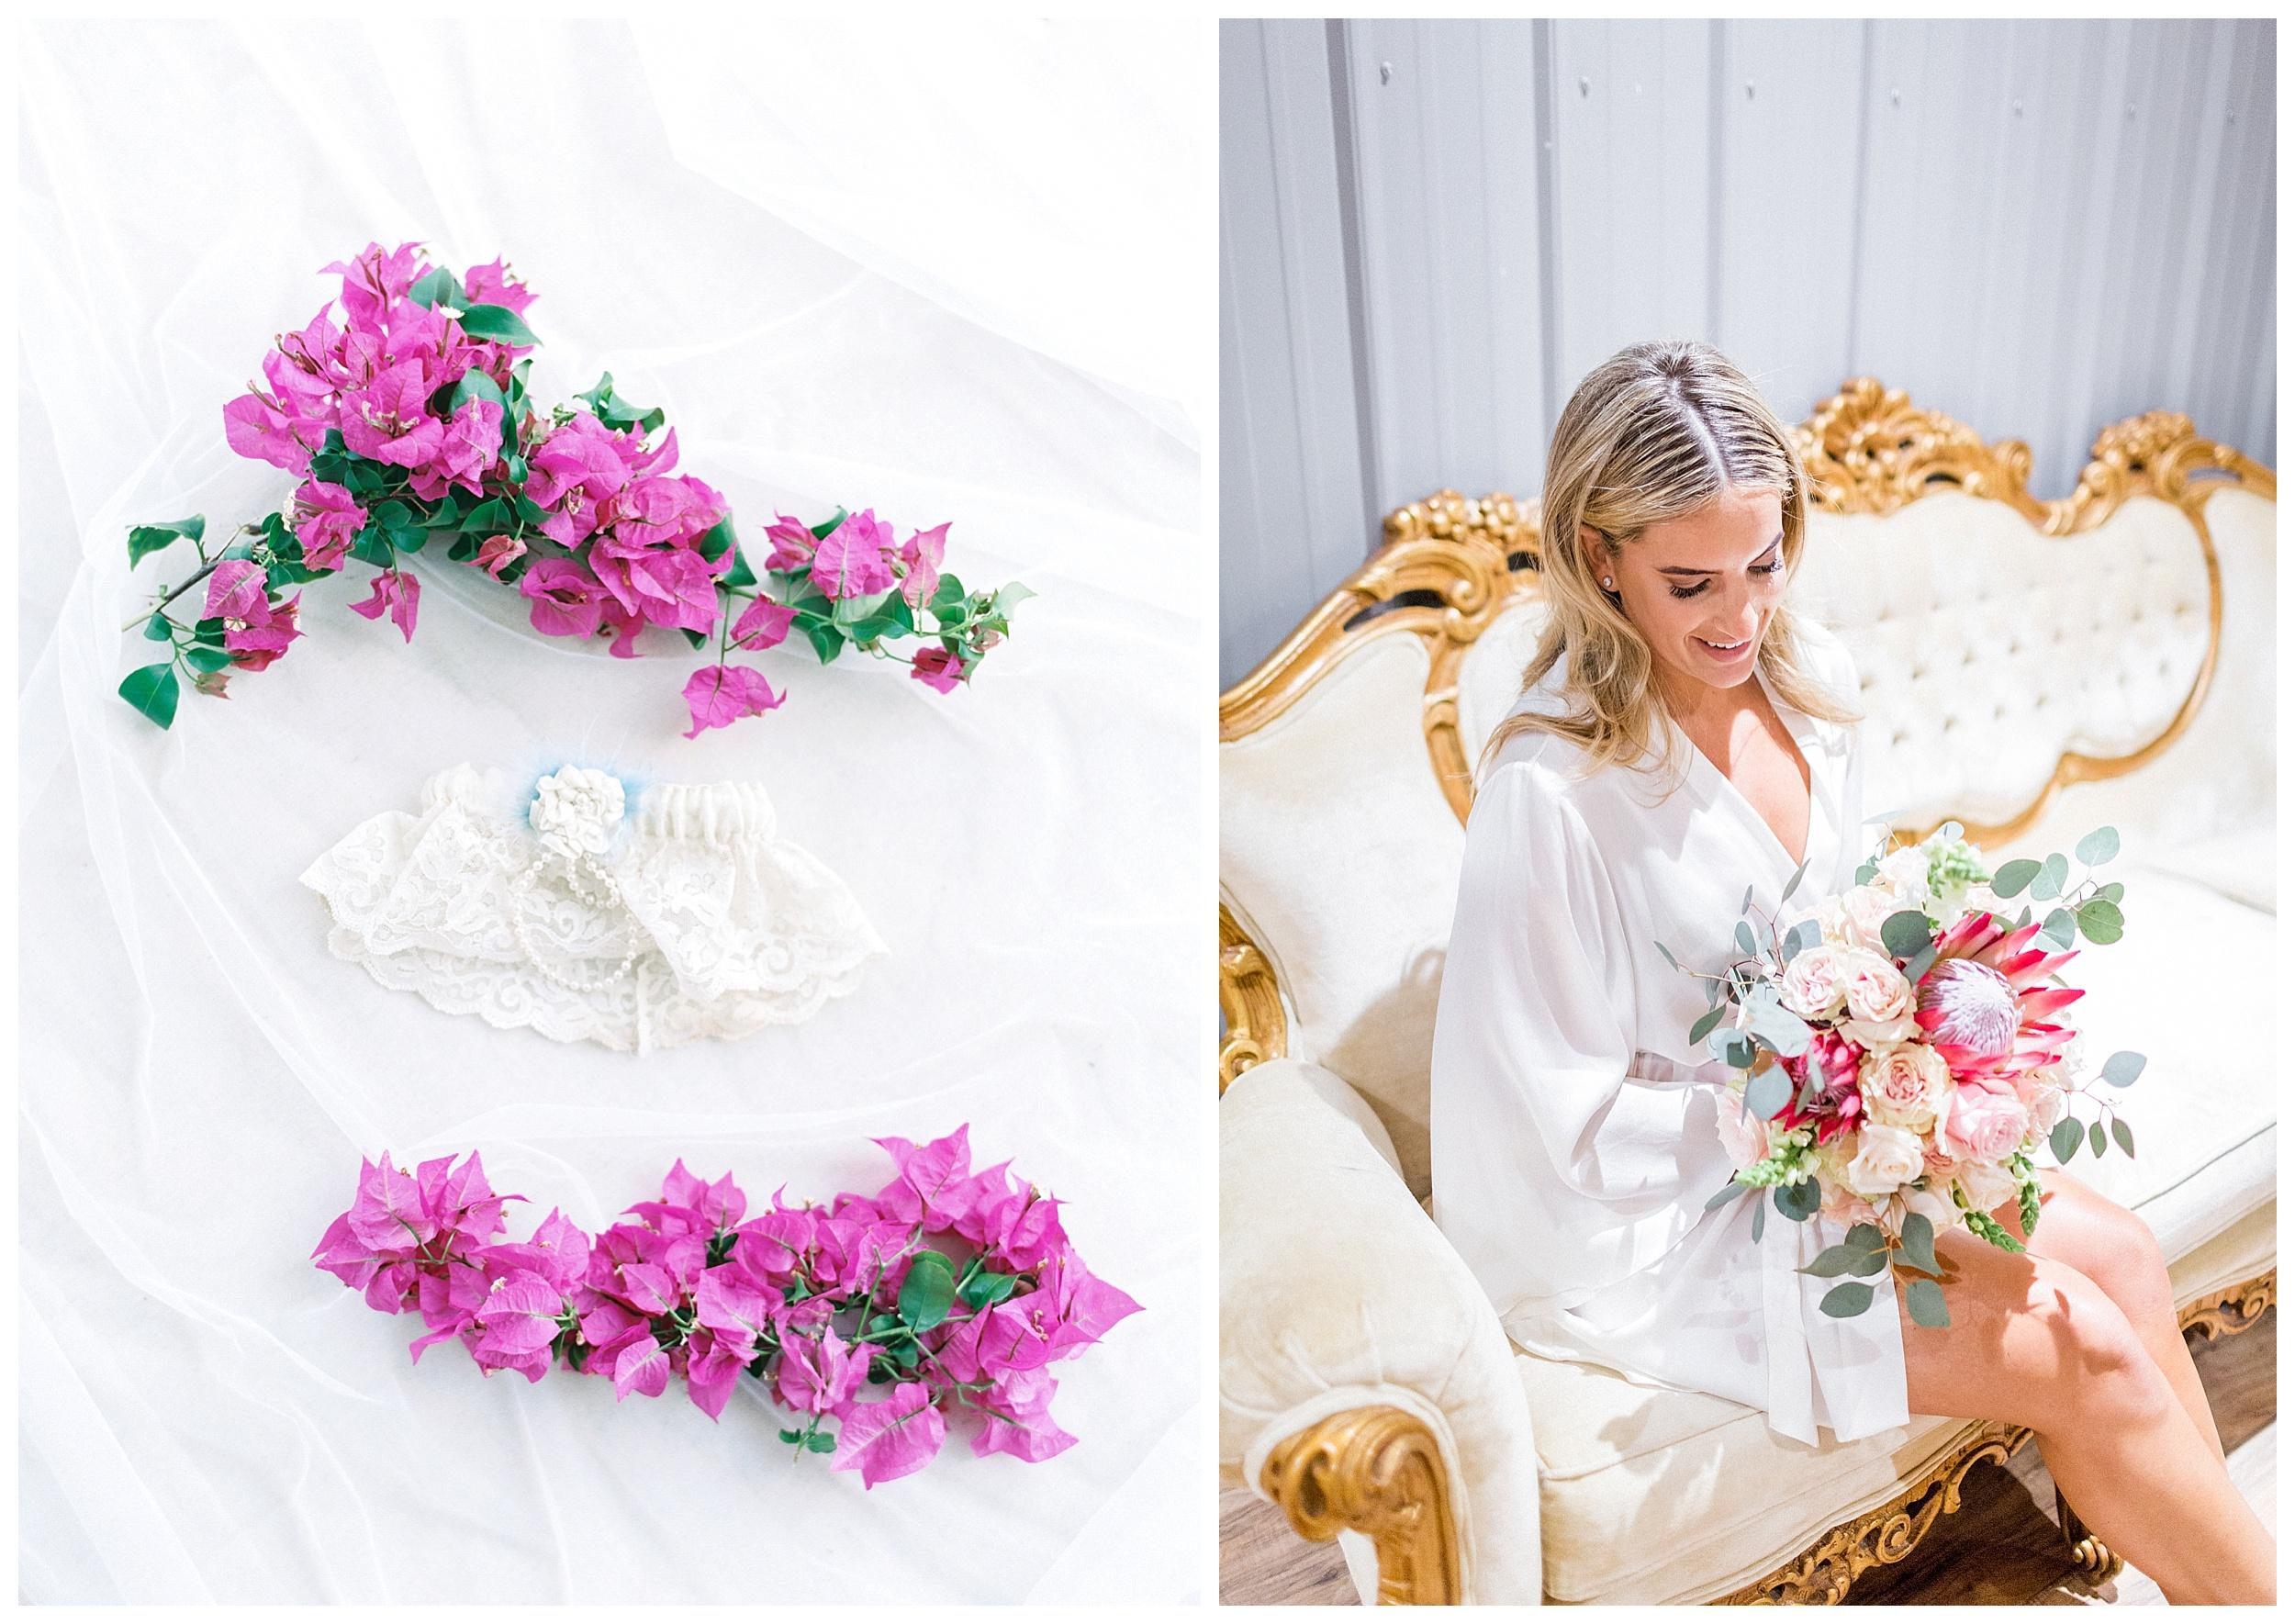 South Florida Wedding Photographer Kir Tuben_0002.jpg